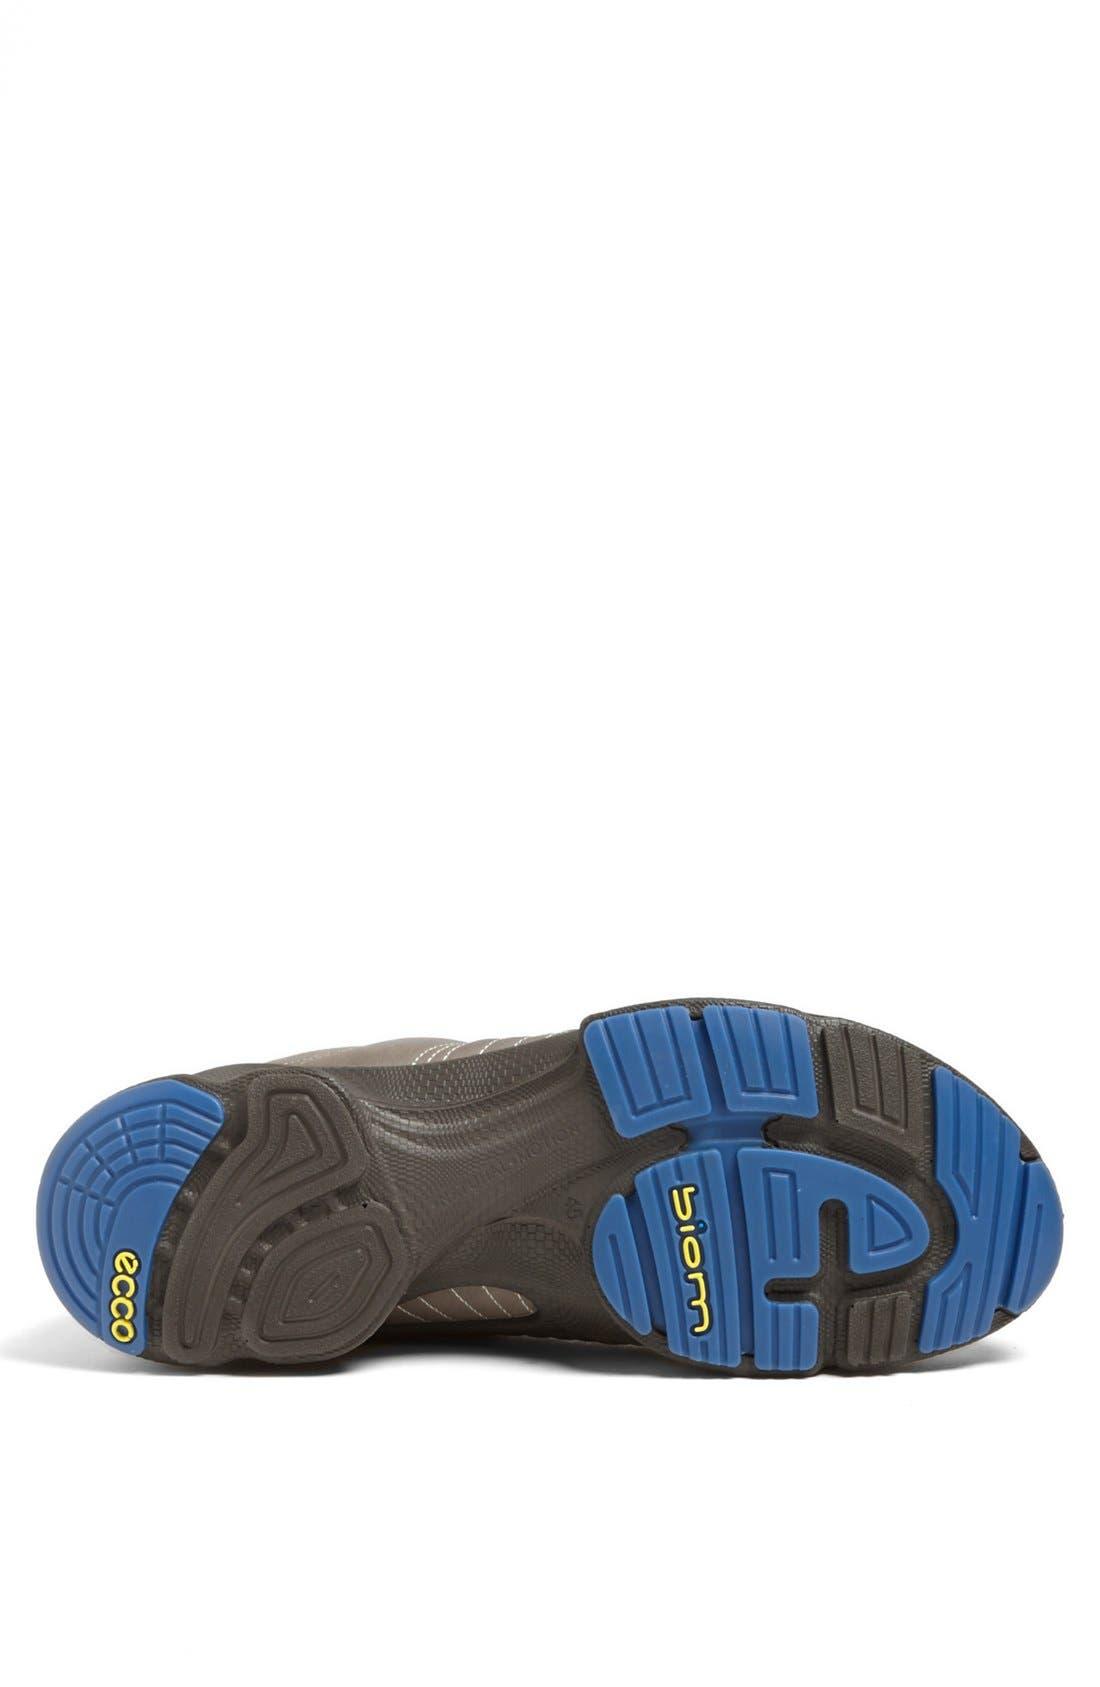 Alternate Image 4  - ECCO 'Biom Training 1.1' Fitness Shoe (Men)